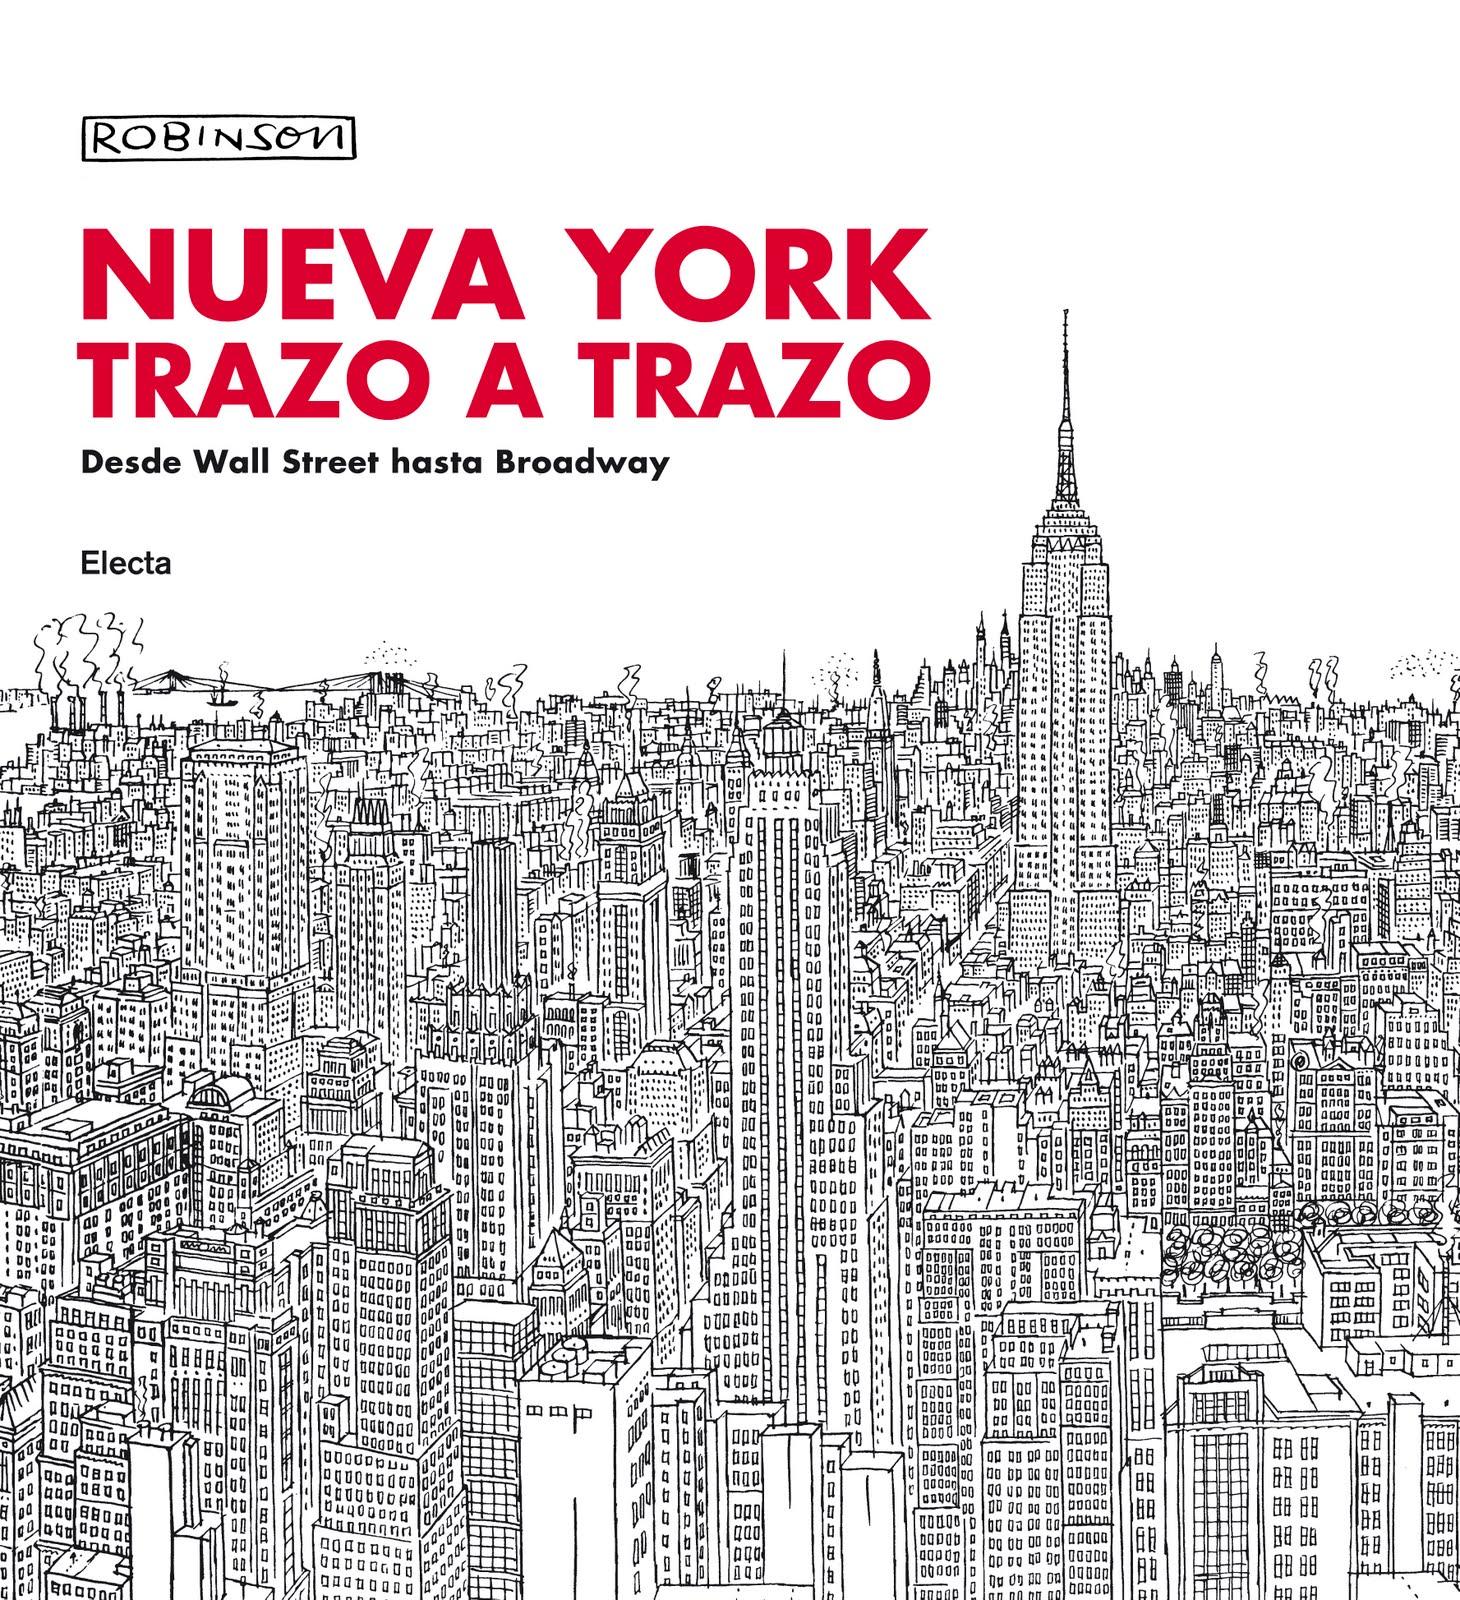 Nueva+York+trazo+a+trazo.jpg